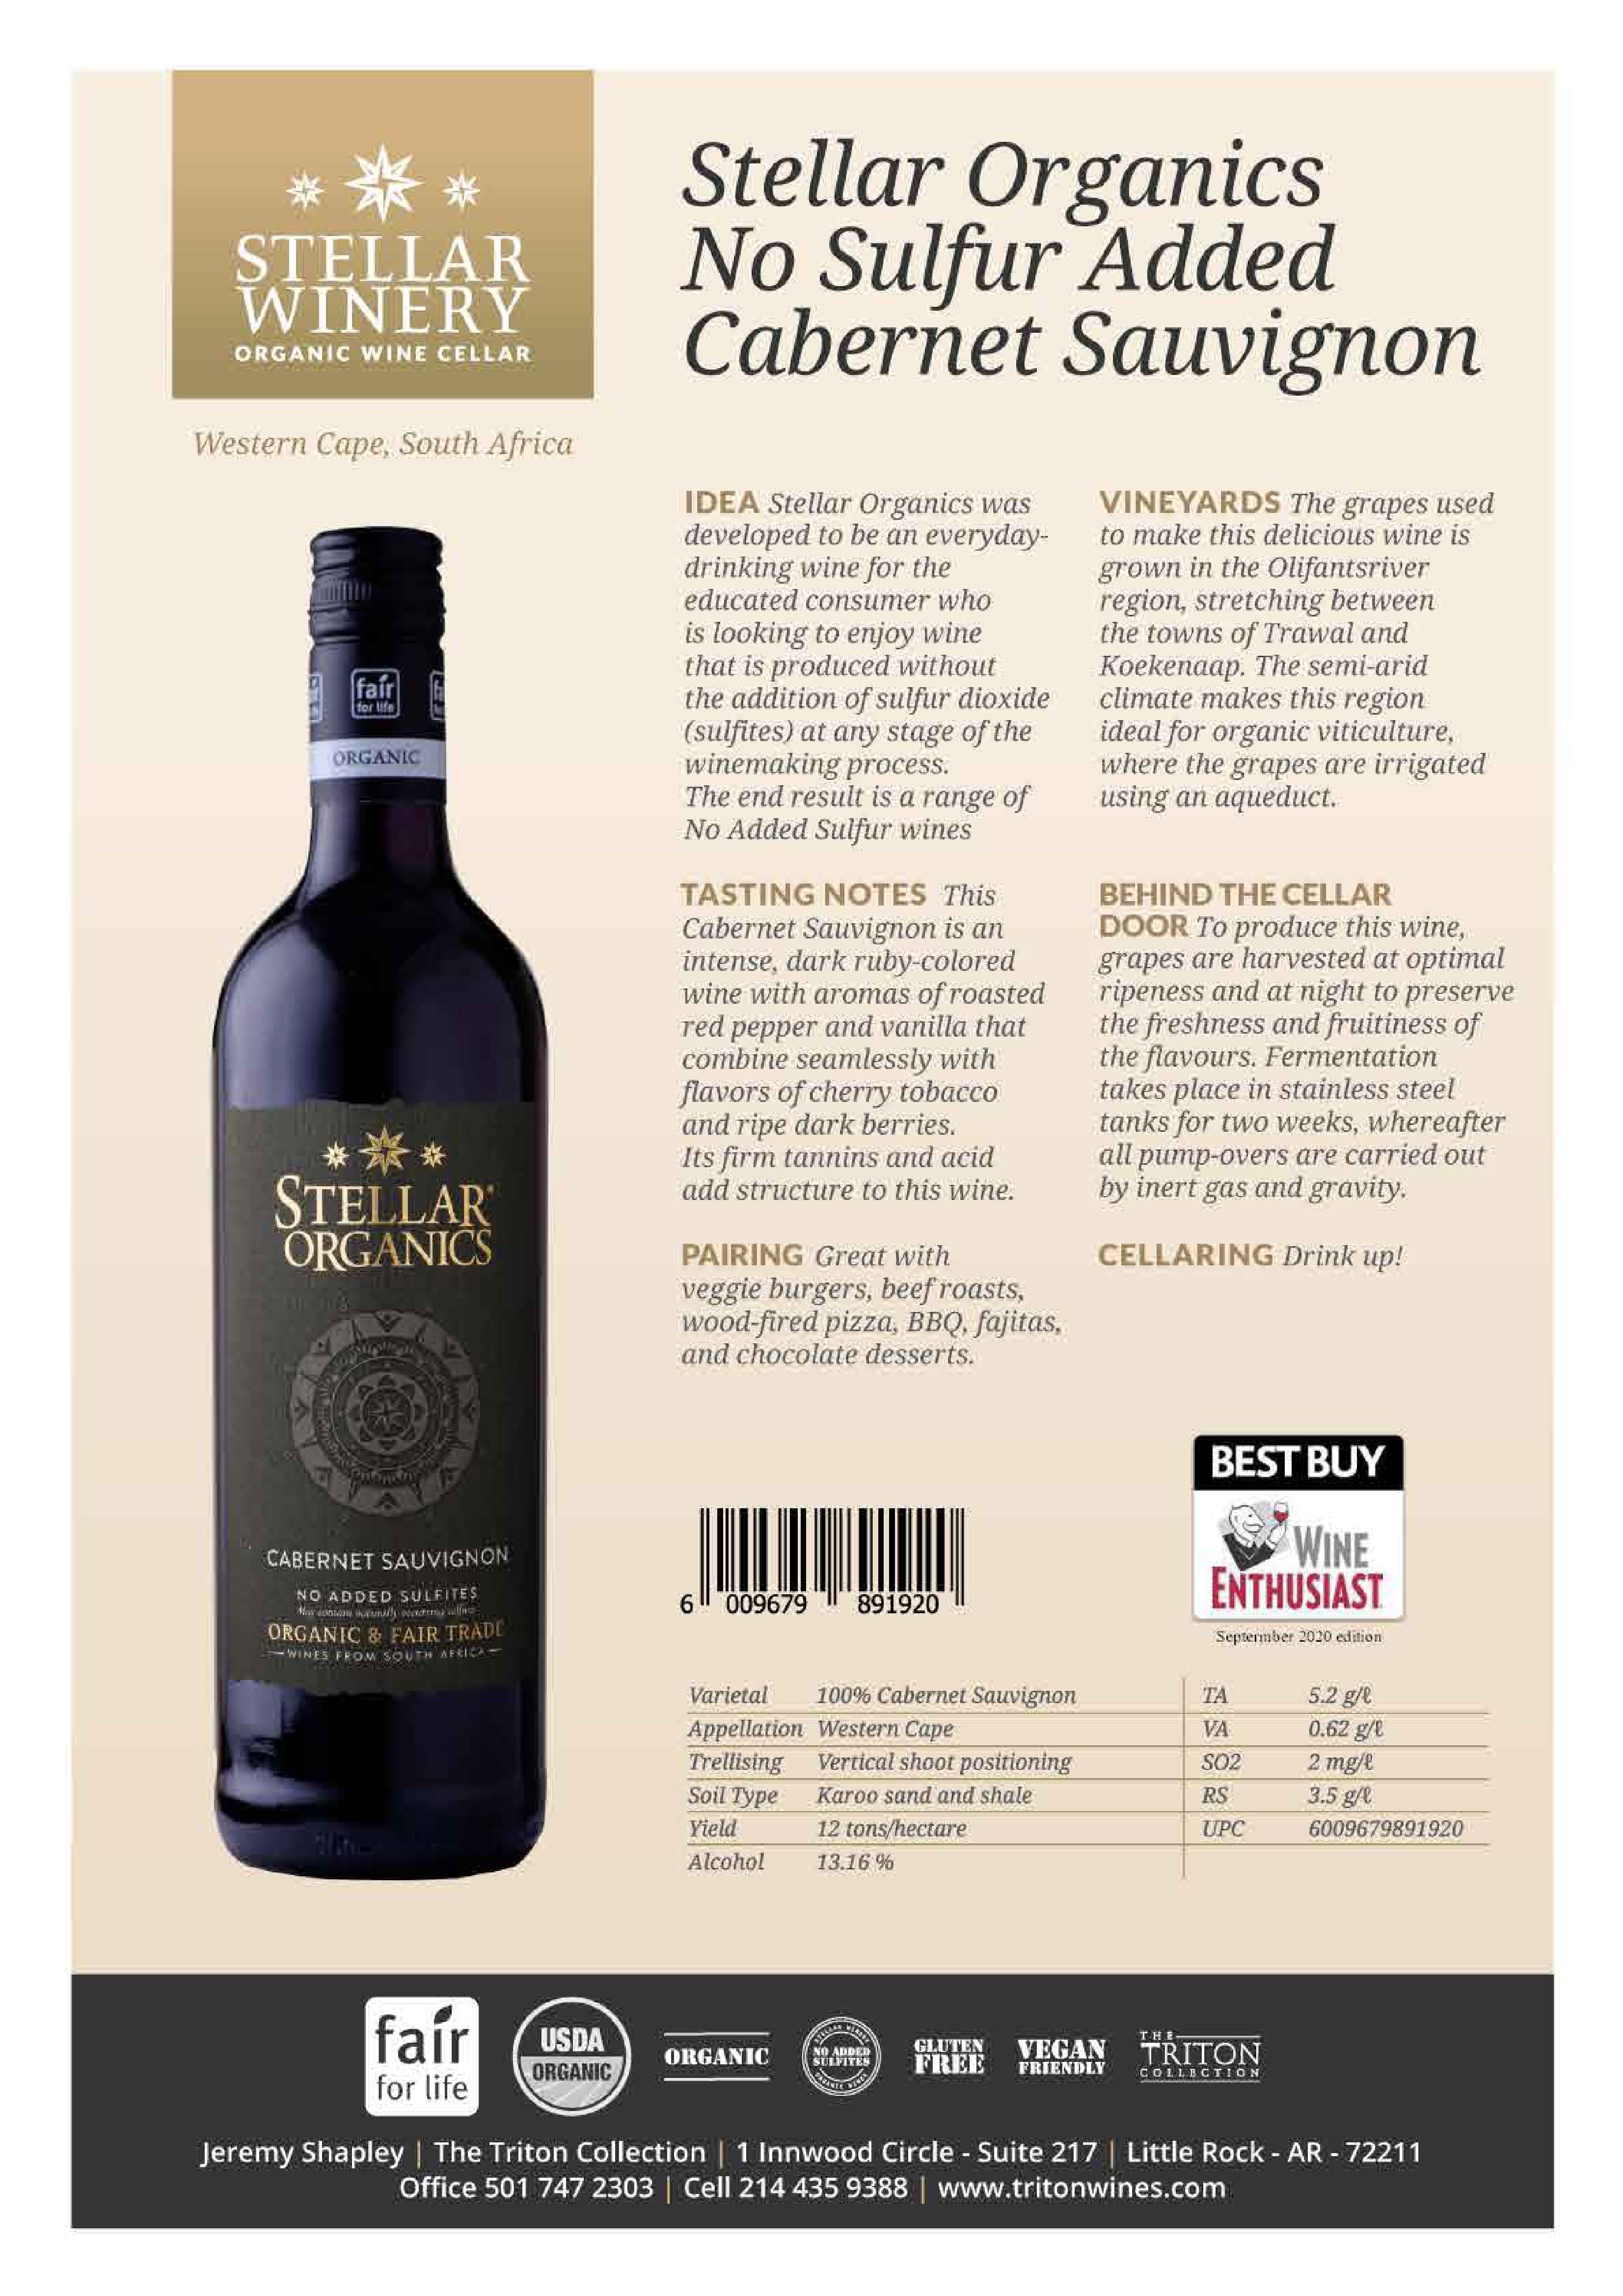 Stellar Organics Cabernet Sauvignon Tech Sheet